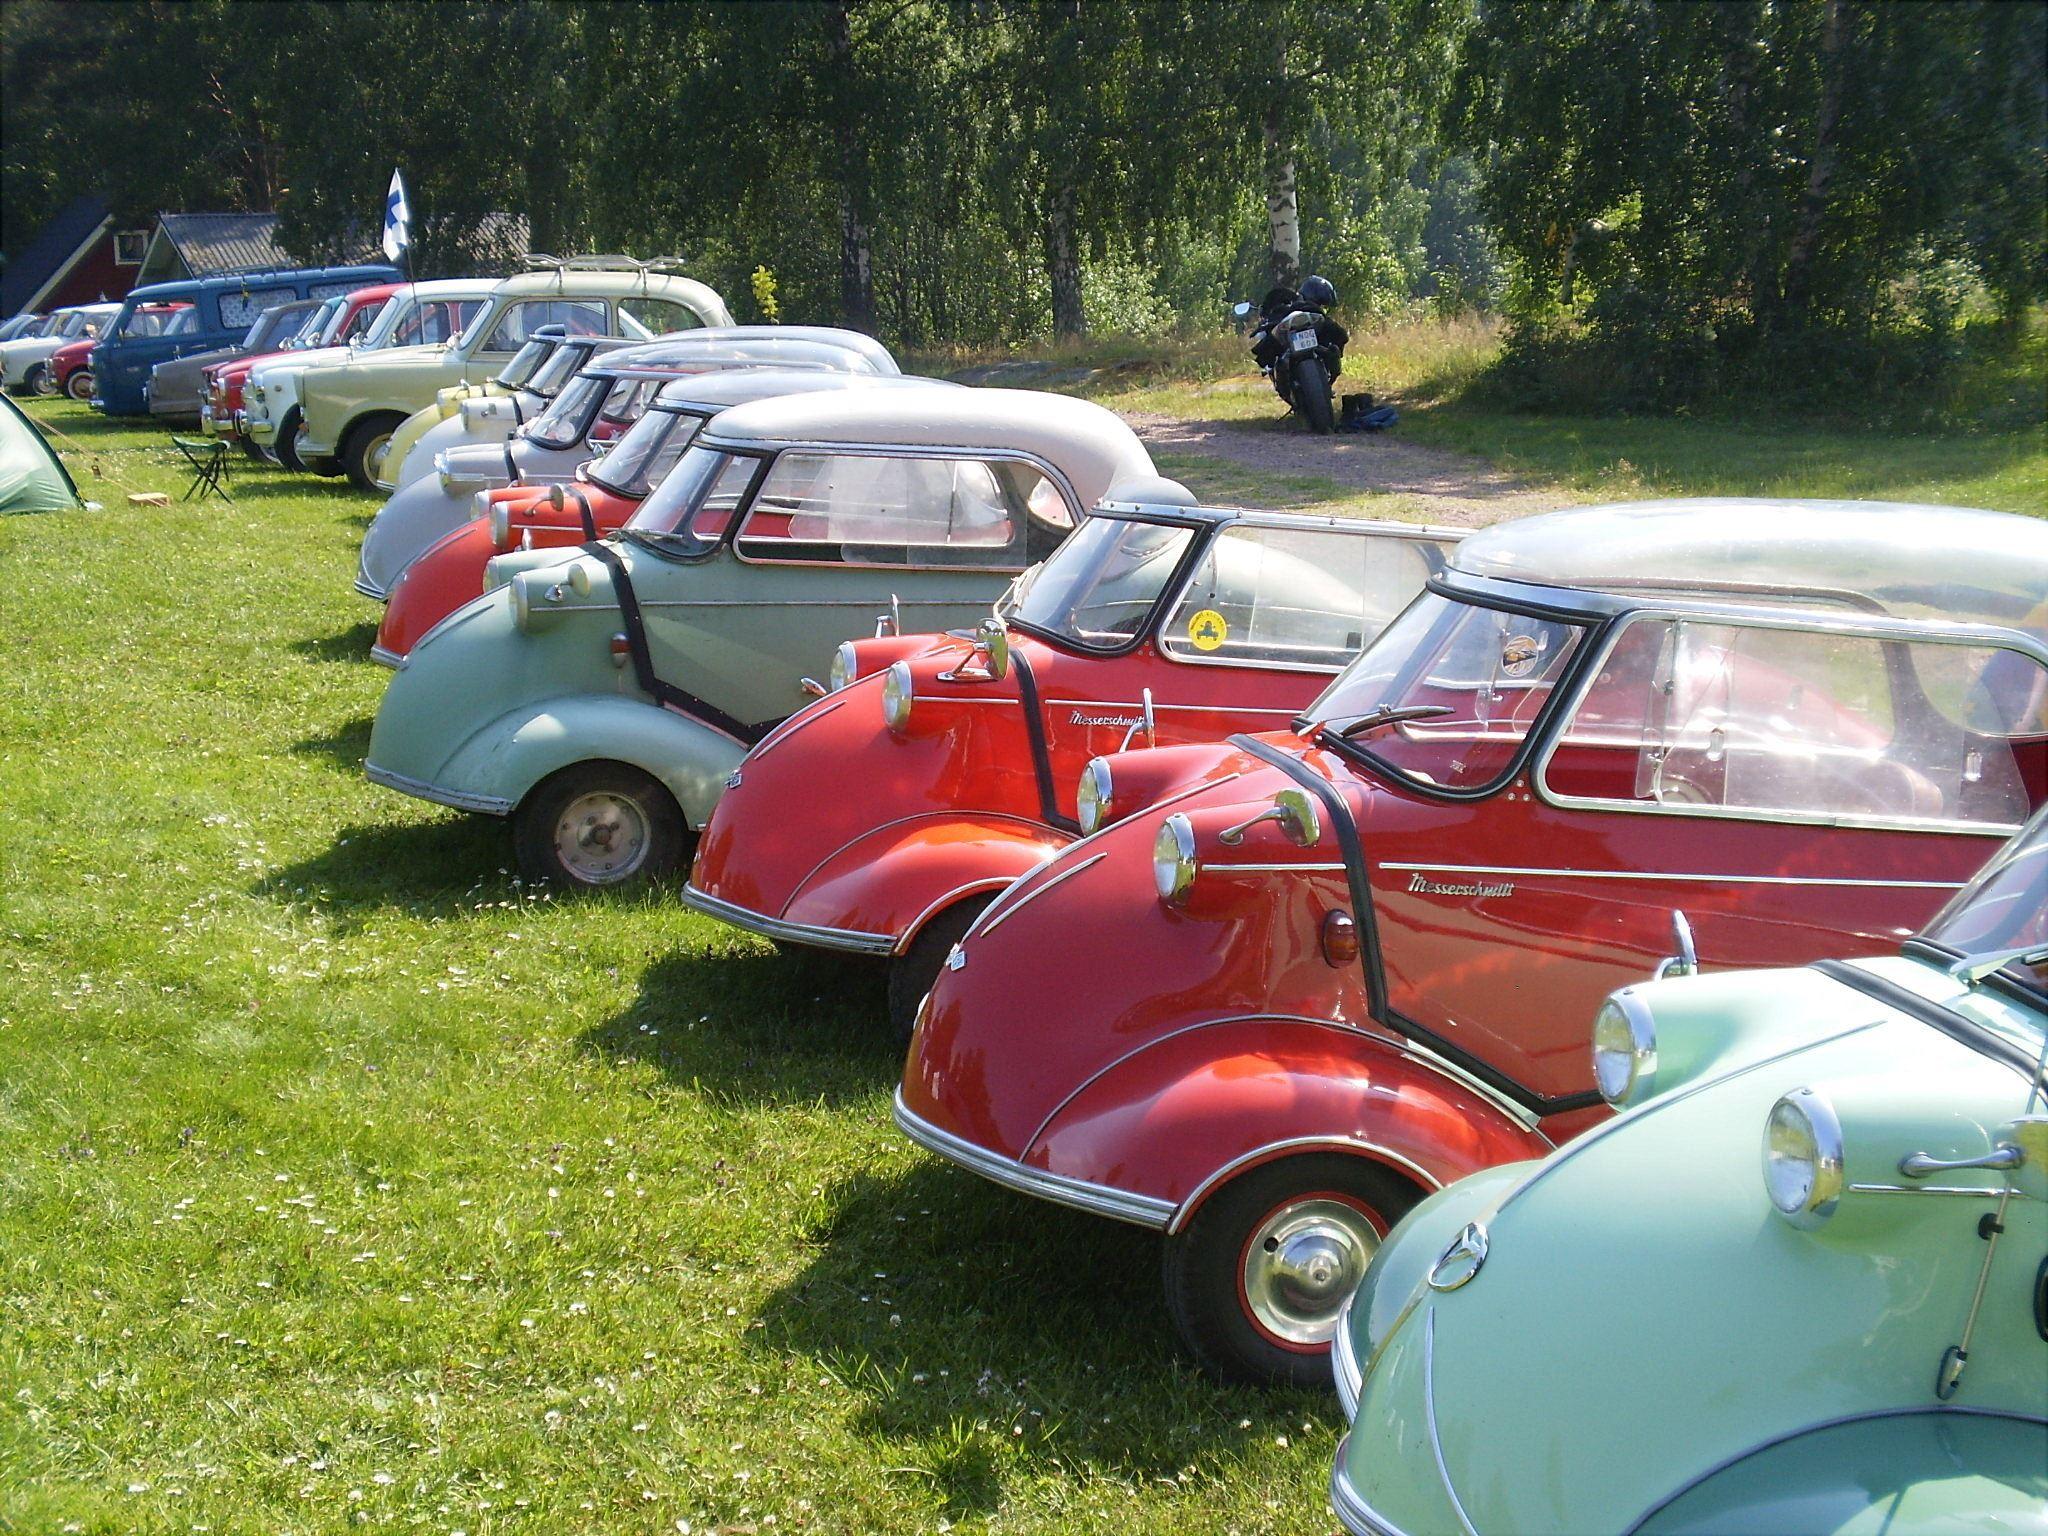 Ålandsrally 2018 - dwarf car exhibition in Eckerö